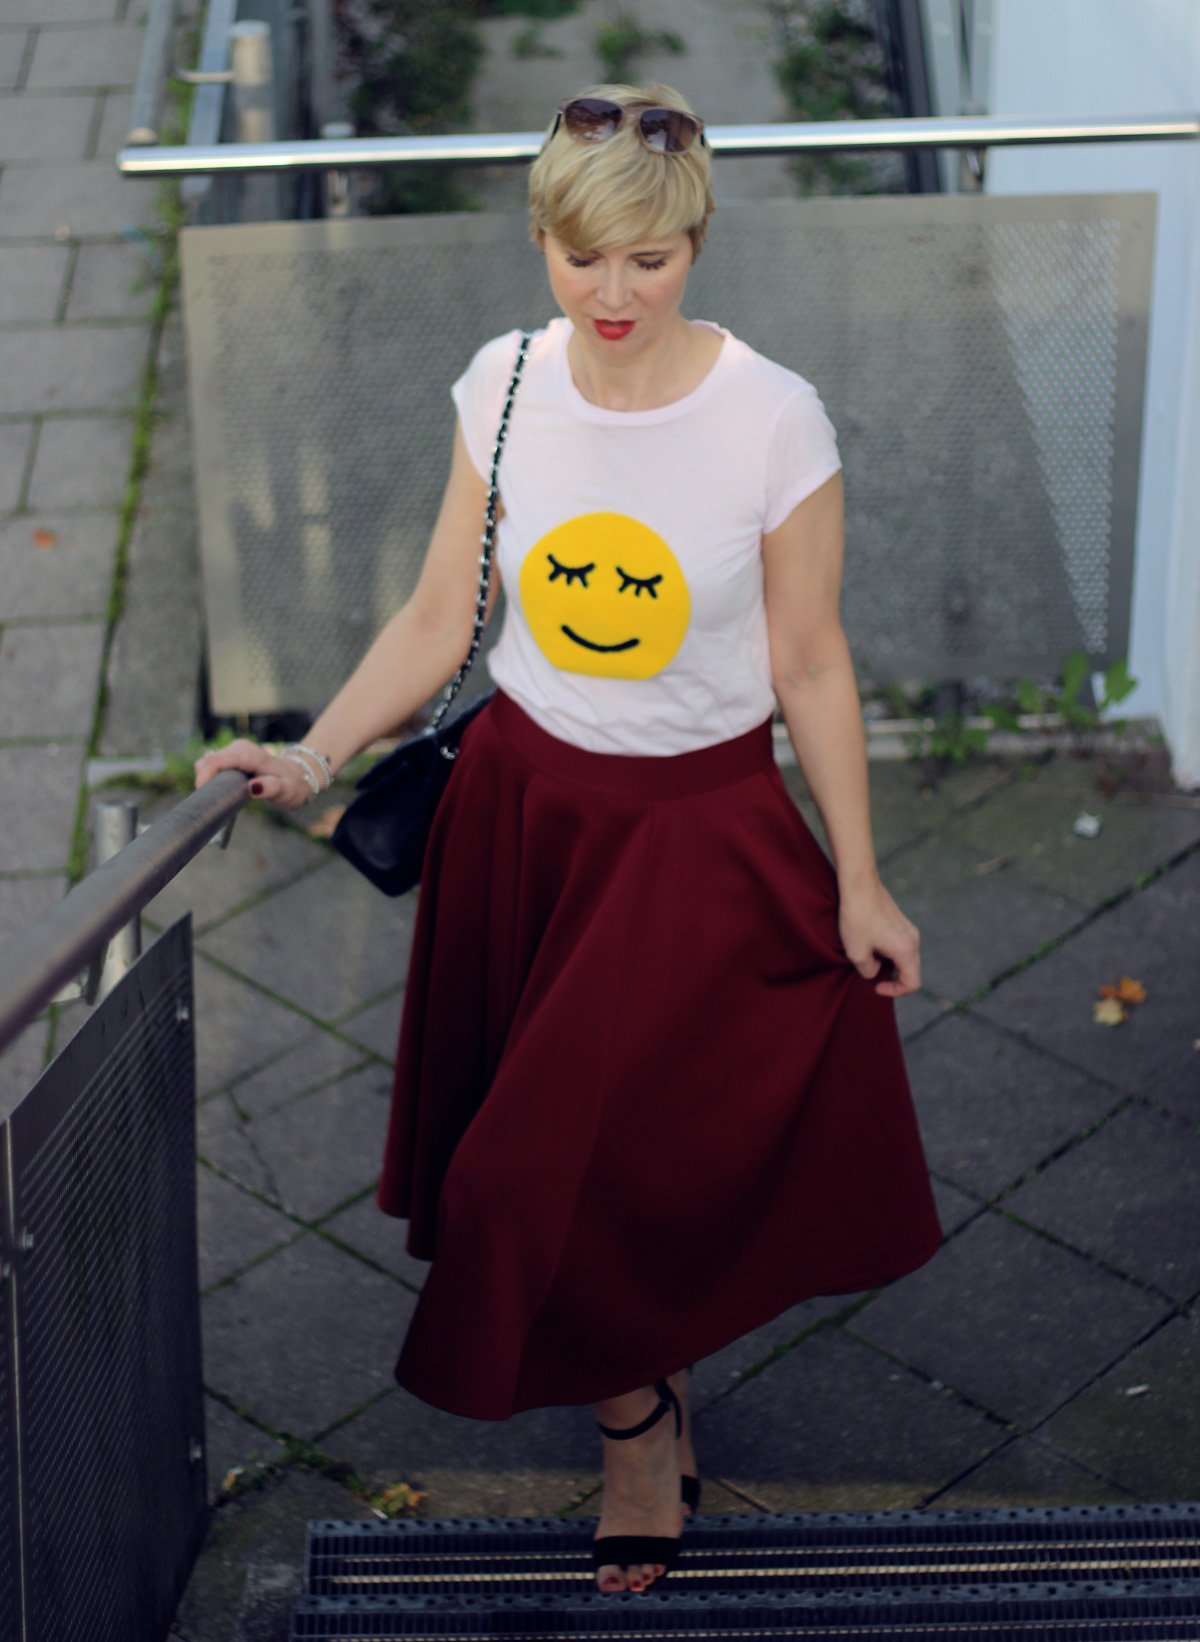 conny doll lifestyle: shirt mit smiliey, burgunderrock, spaetsommerlook, sandale,